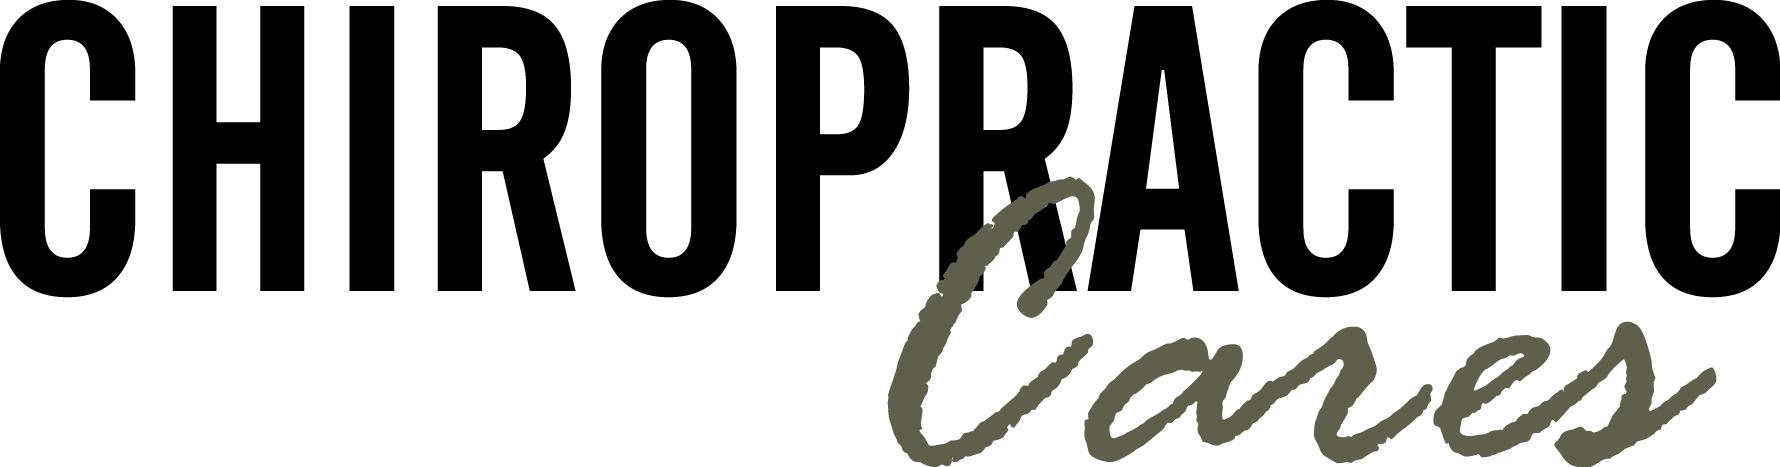 Chiropractic Cares